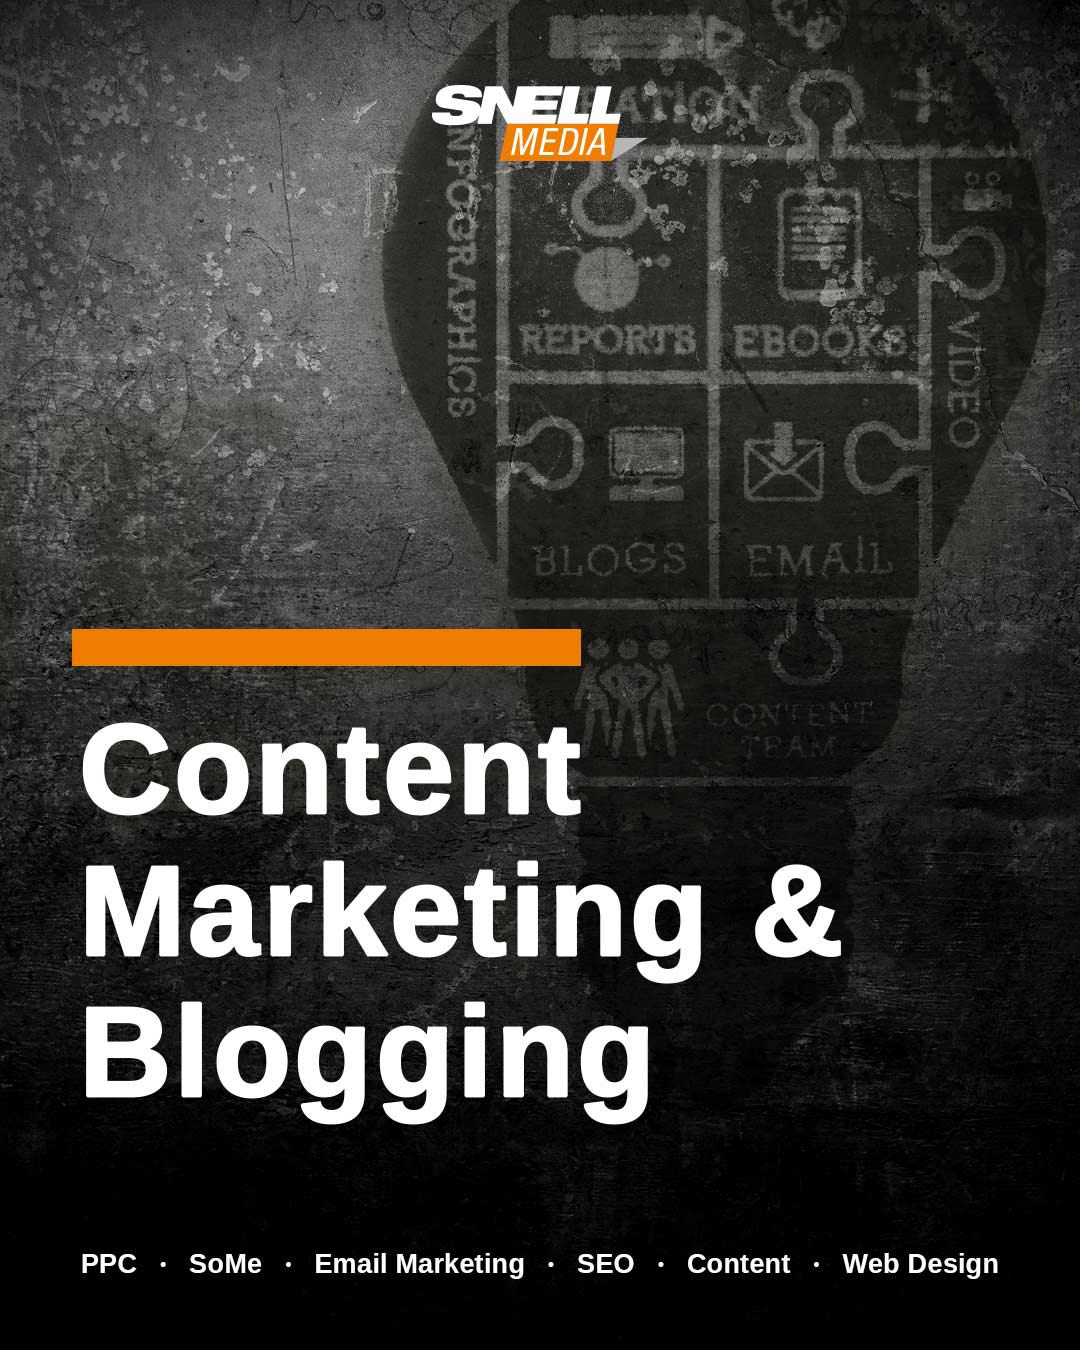 Content Marketing & Blogging 4th B2B Digital Marketing Trend